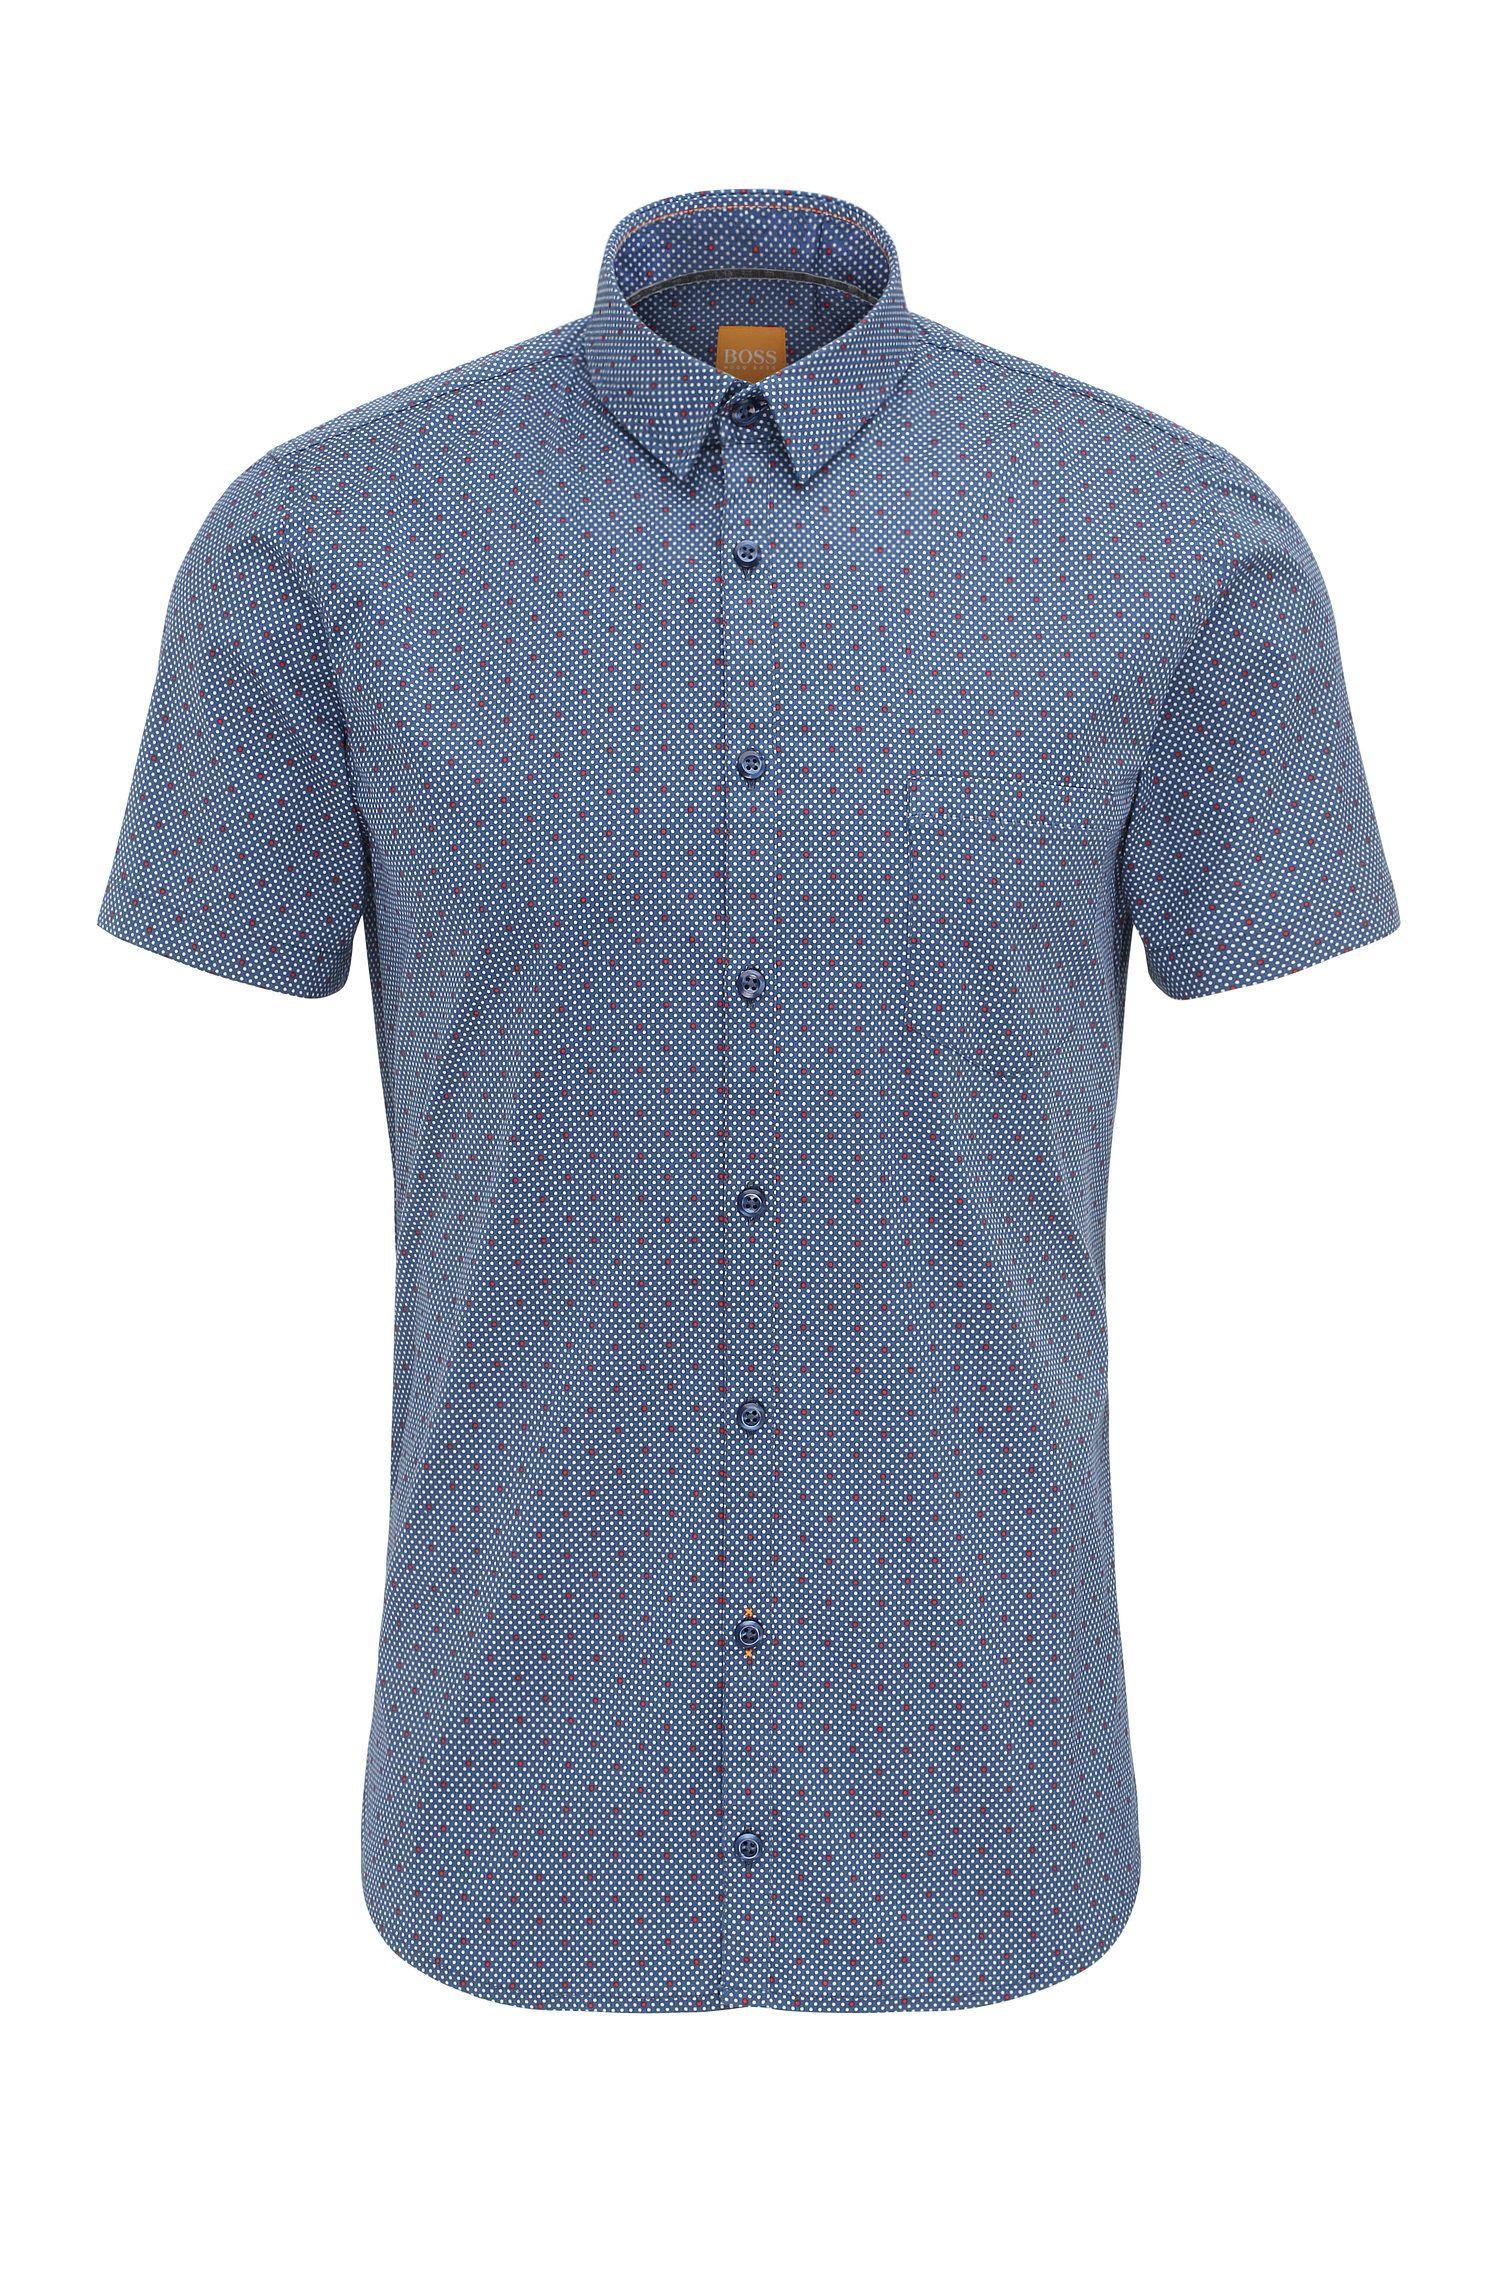 'Eglam Short' | Extra Slim Fit, Stretch Cotton Button Down Shirt